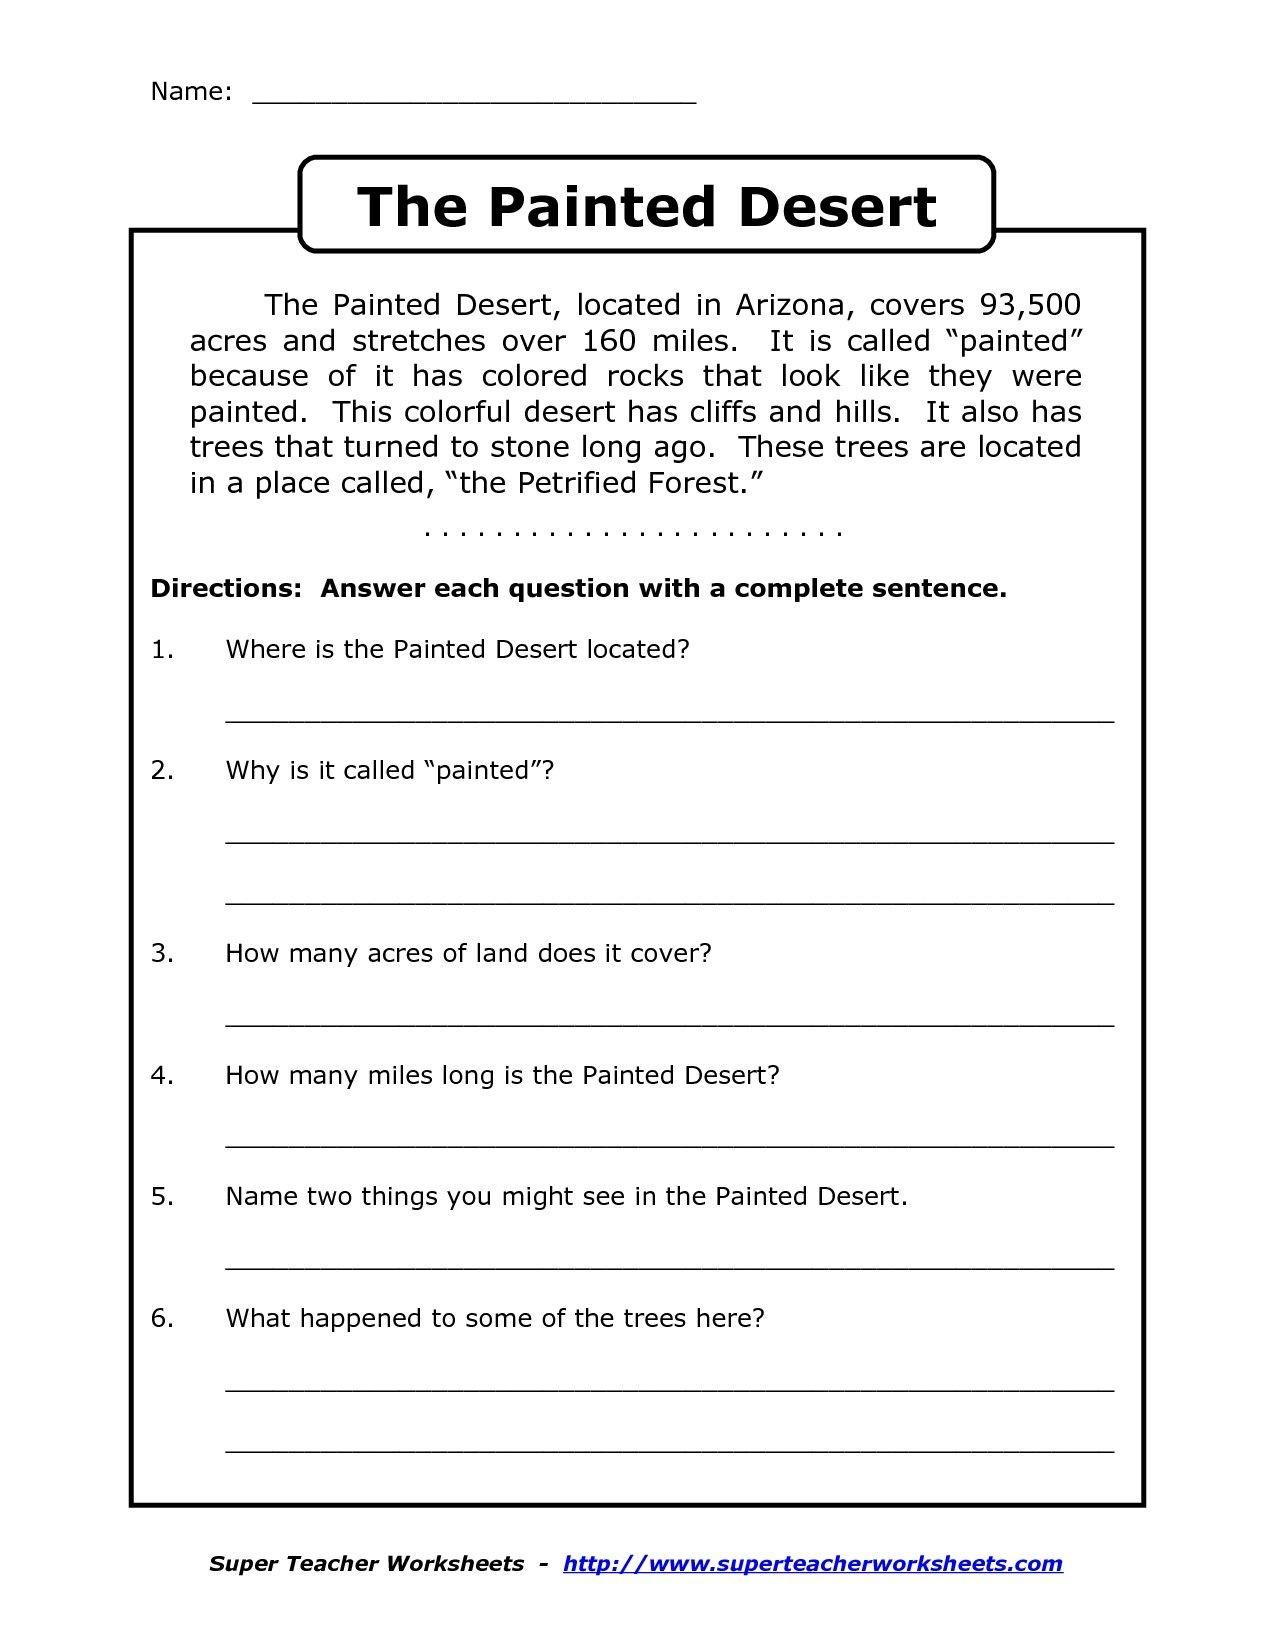 Image Result For Free Printable Worksheets For Grade 4 Comprehension - Free Printable Reading Comprehension Worksheets Grade 5